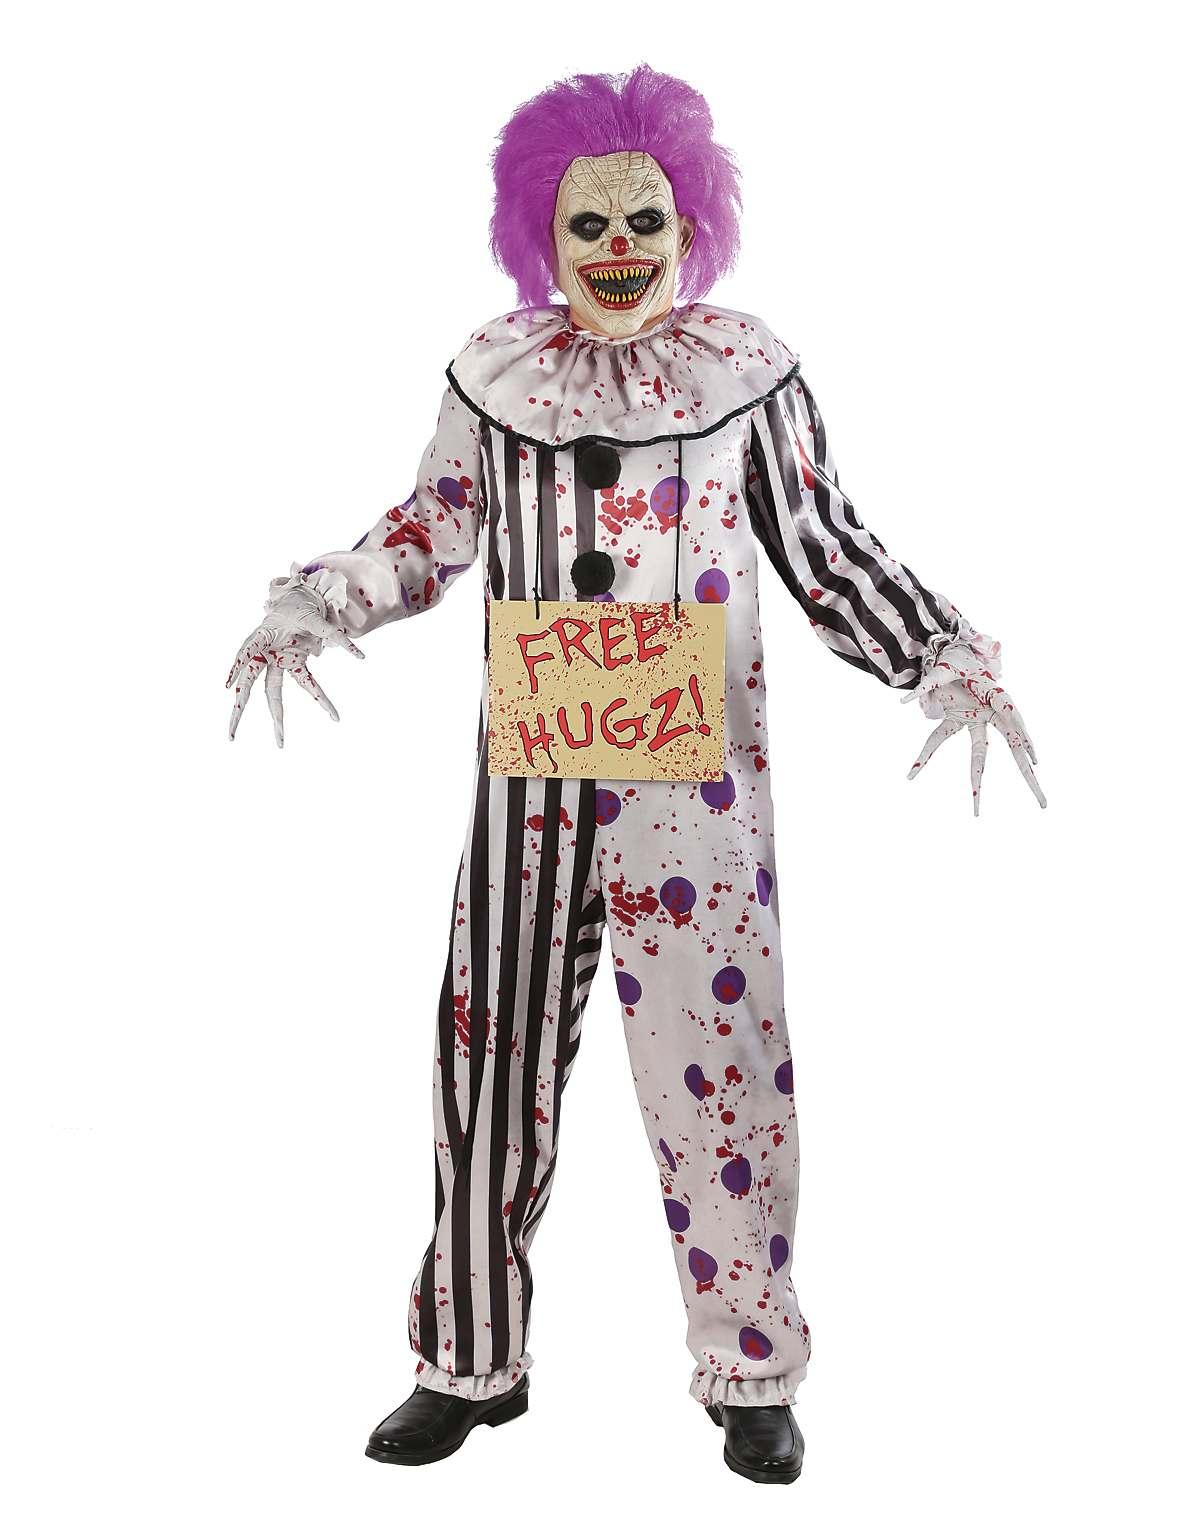 Adult Hugz the Clown costume